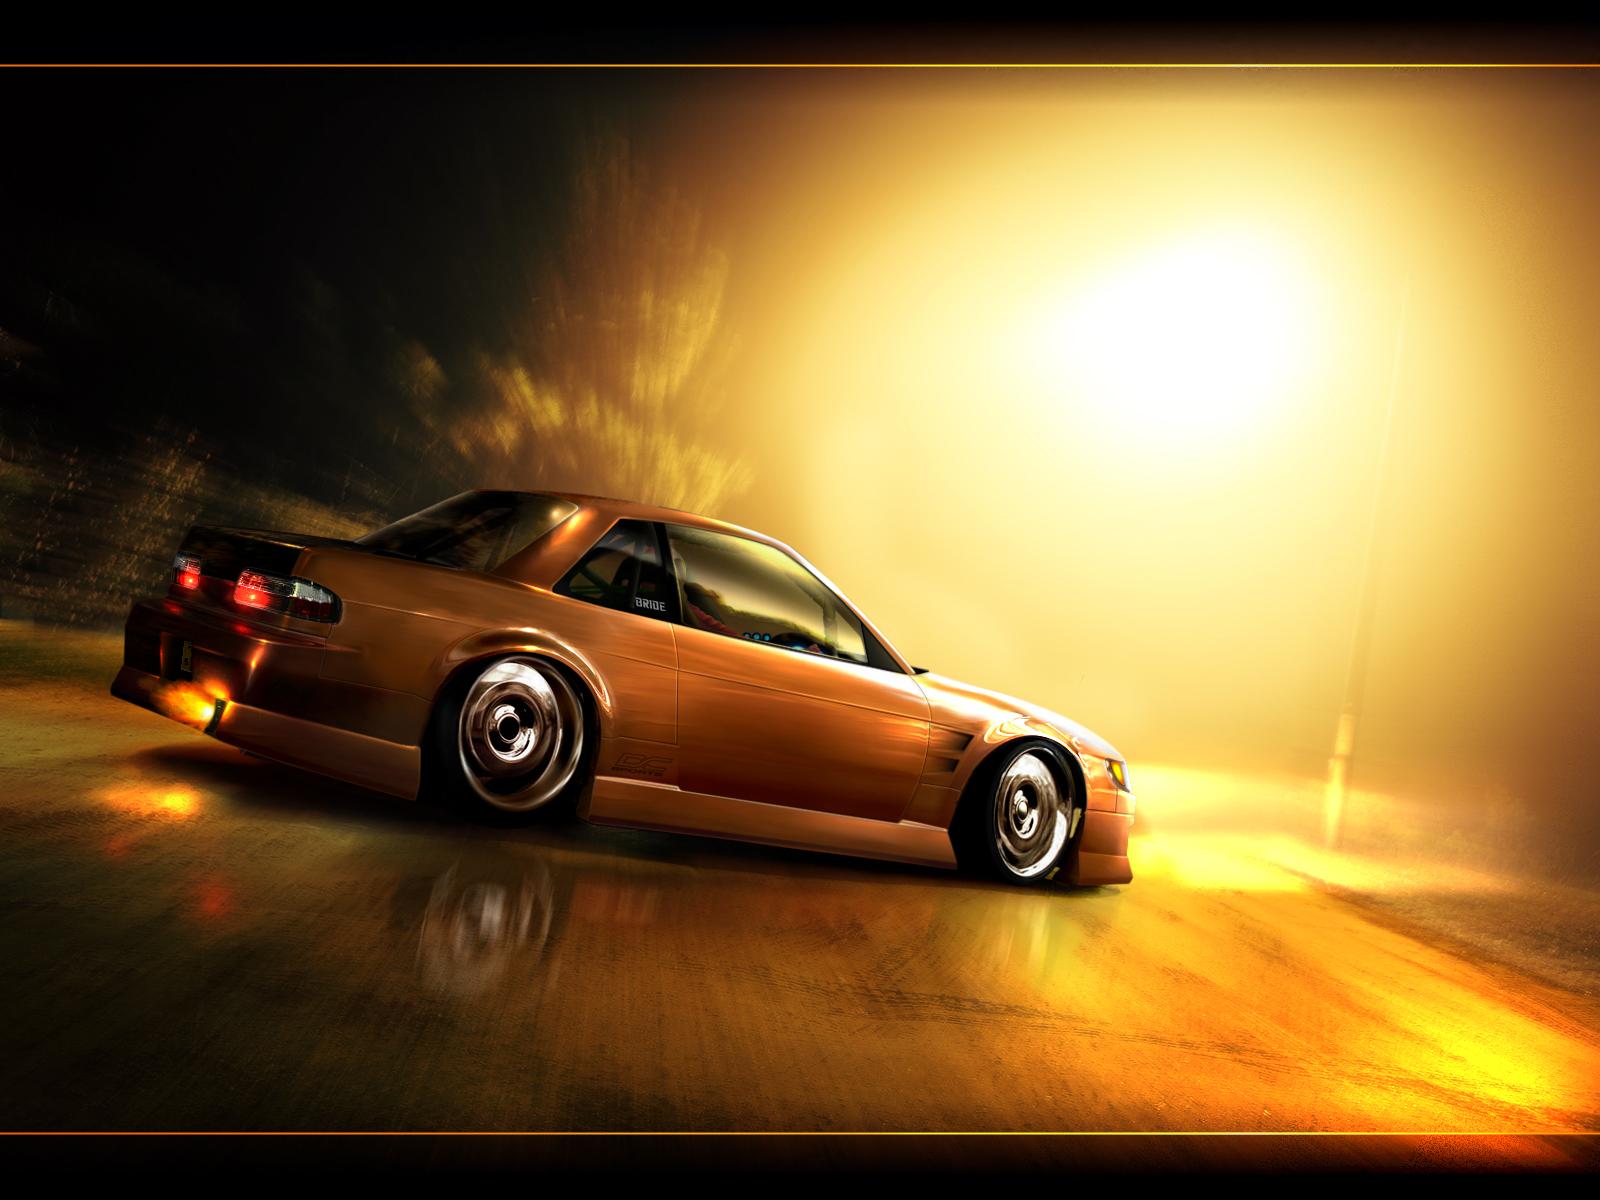 http://4.bp.blogspot.com/-hOKdeM9P92M/T0T-Warg2bI/AAAAAAAADk4/fK02OgDqC2Y/s1600/Nissan_Silvia_s13_Street_Drift.jpg